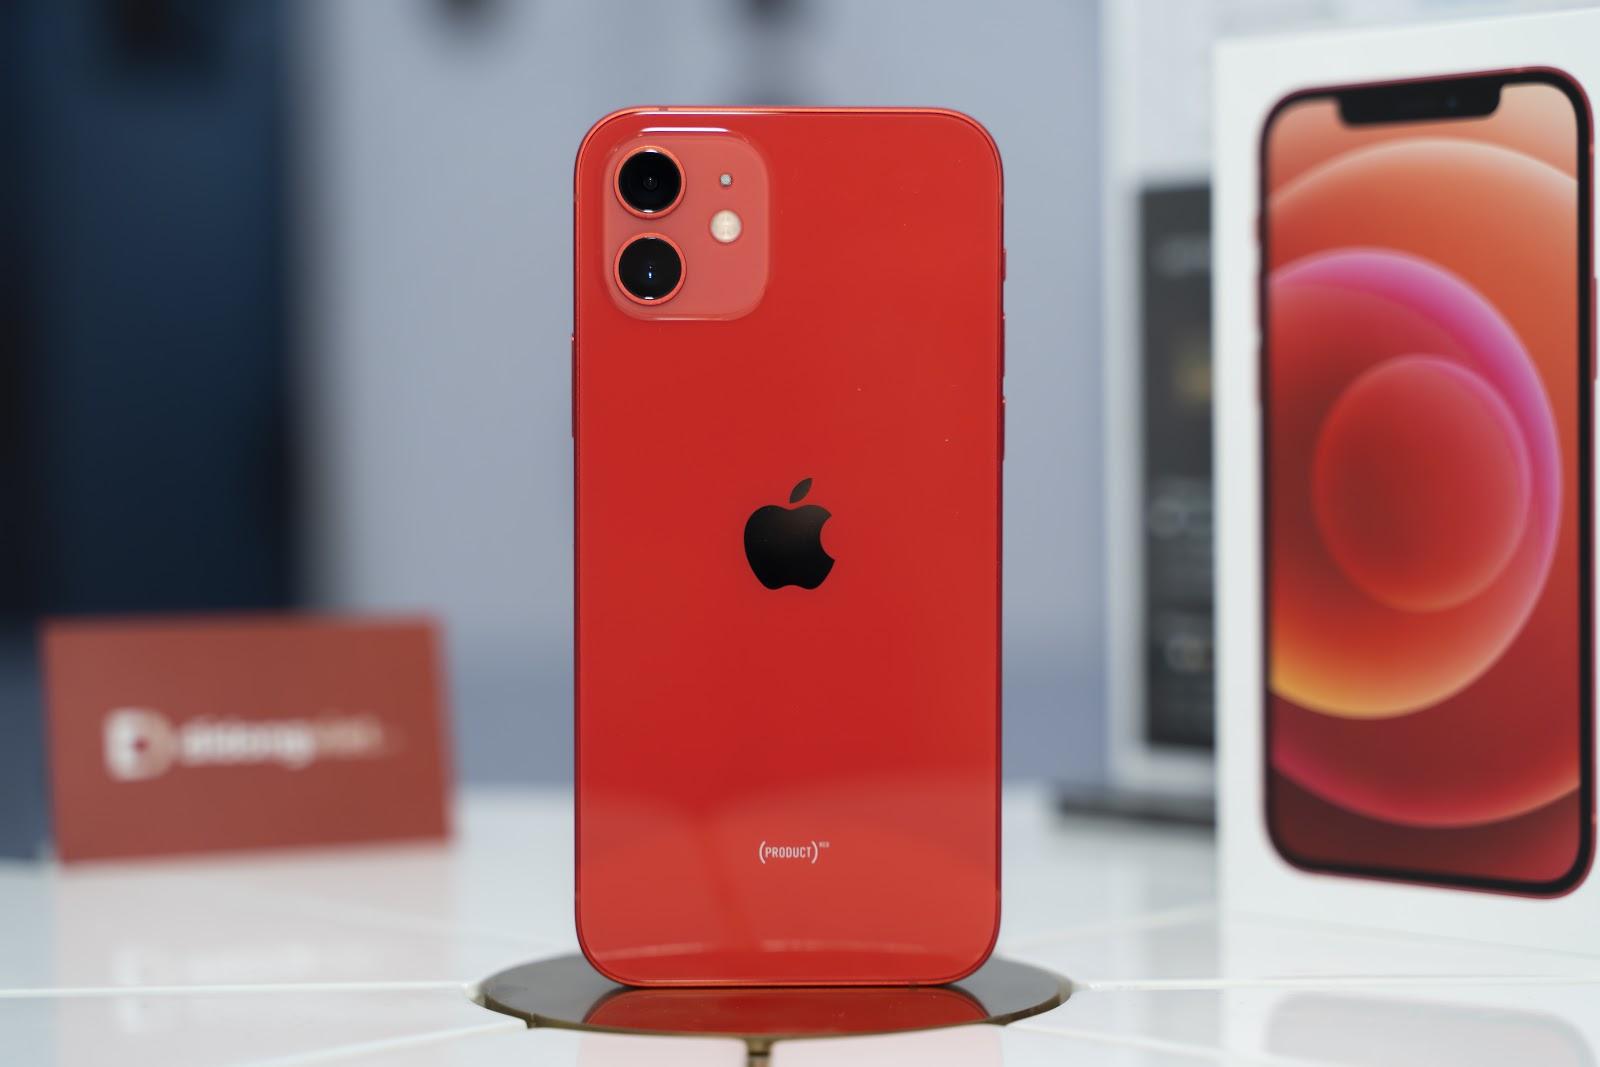 iPhone 12 Pro, 12 Pro Max giảm đến 6,2 triệu dịp cận Tết 4